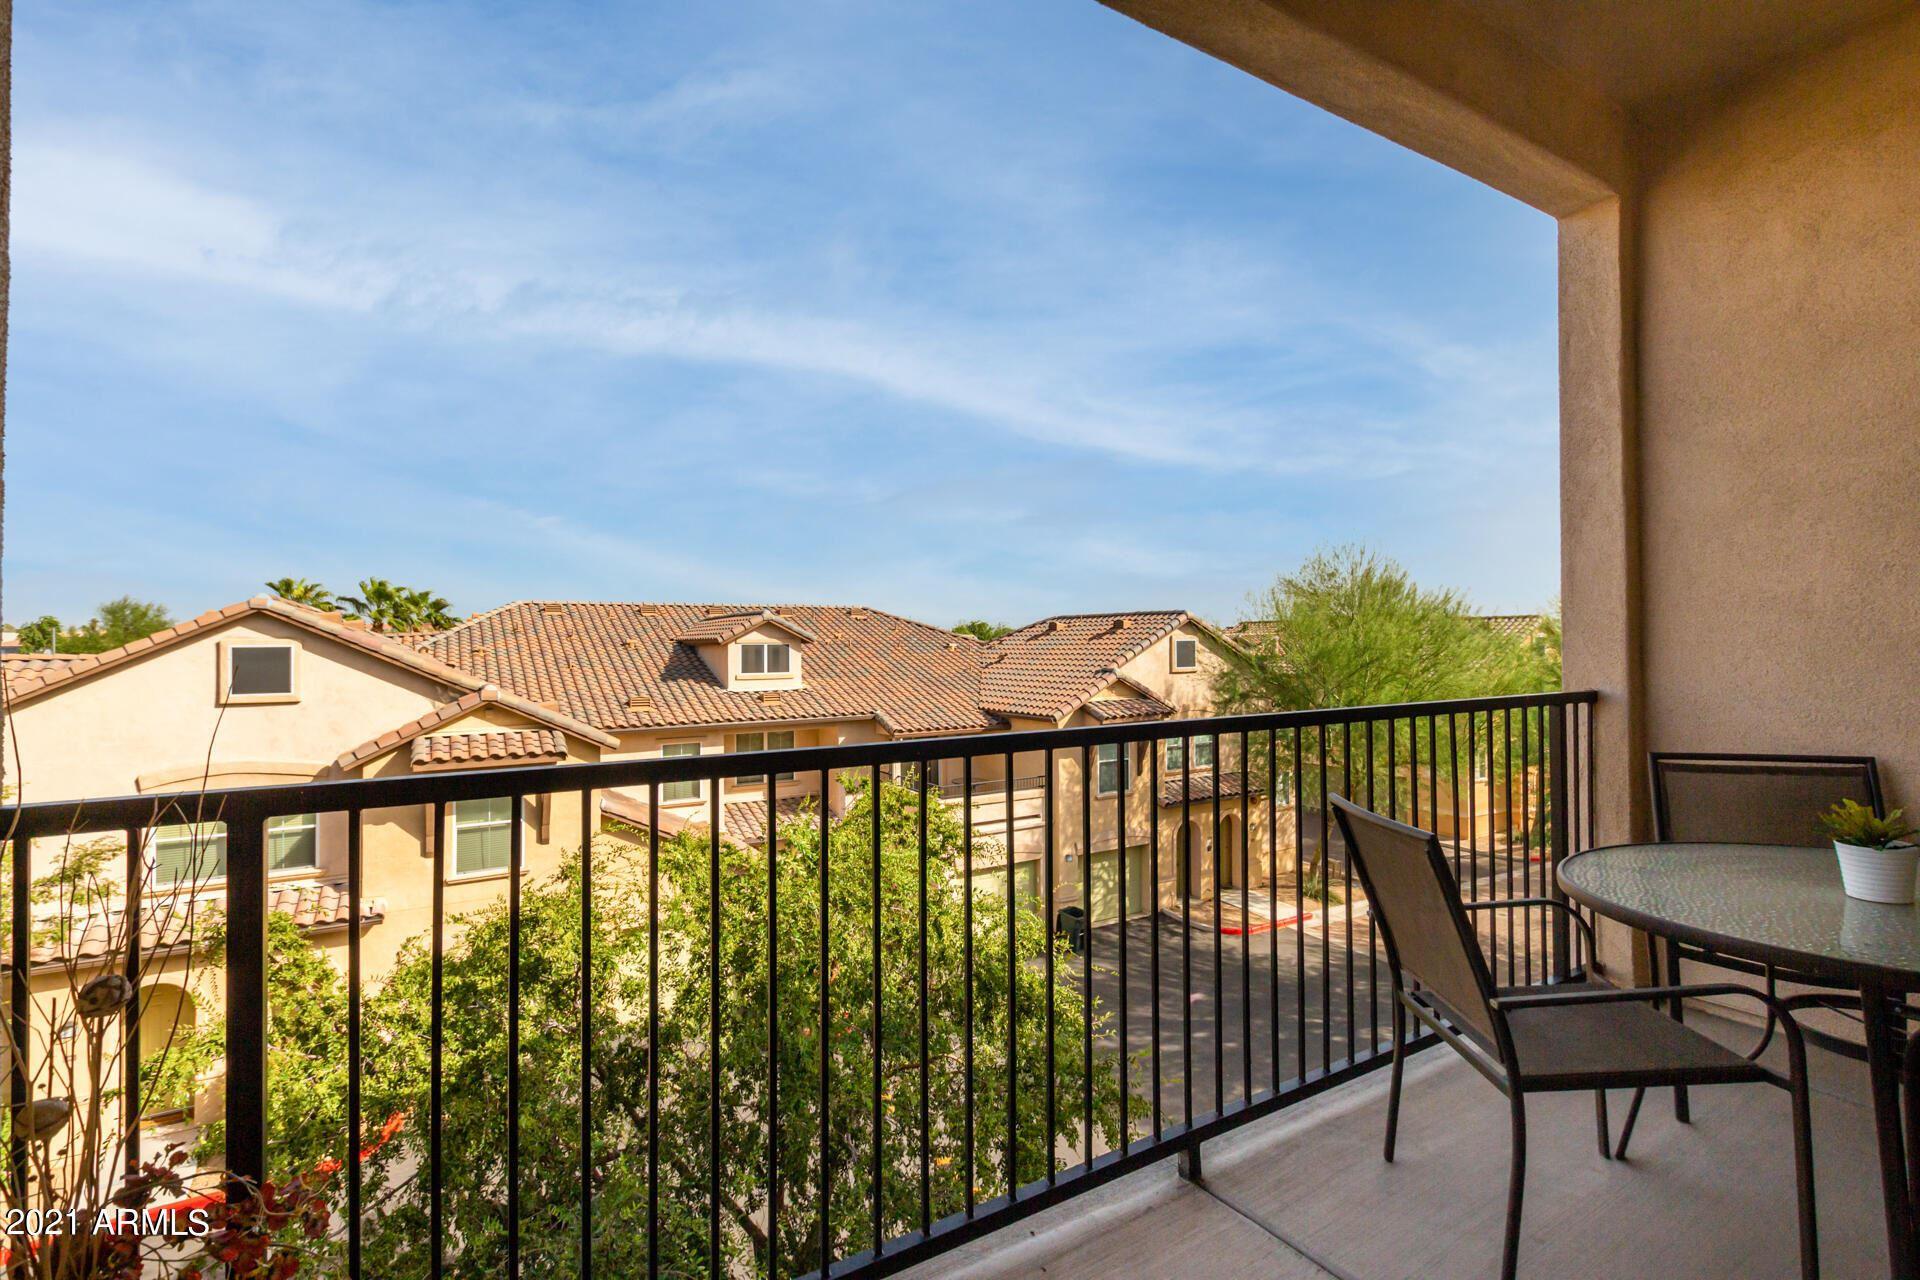 Photo of 14575 W MOUNTAIN VIEW Boulevard #11302, Surprise, AZ 85374 (MLS # 6304515)